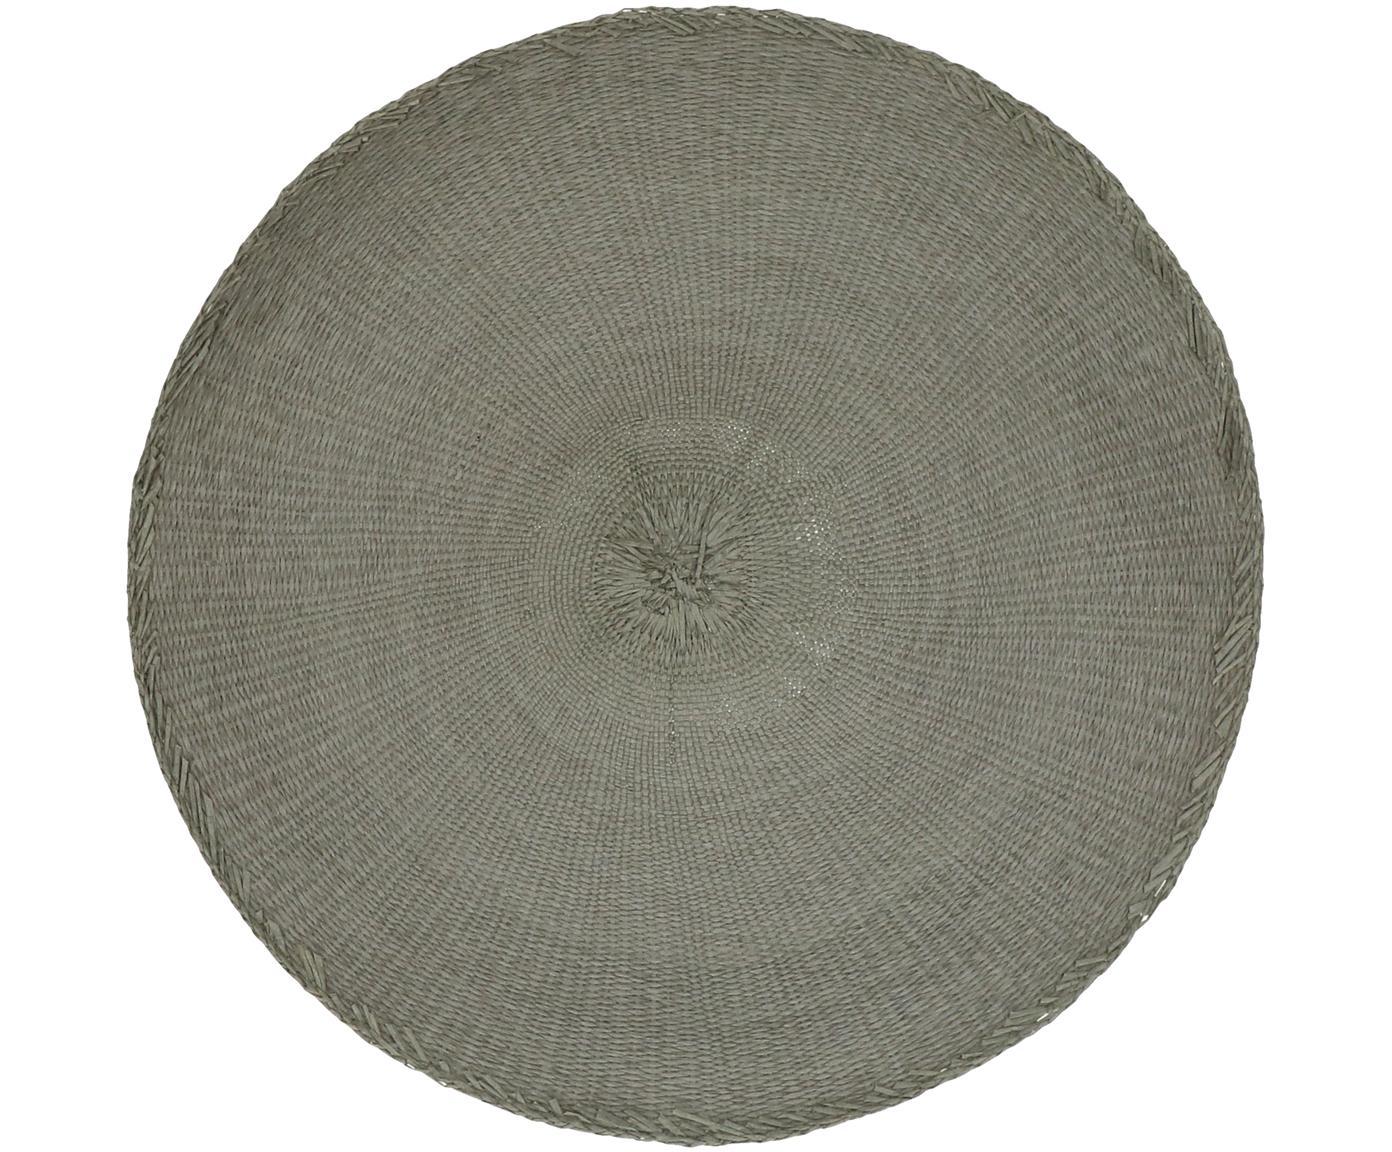 Runde Tischsets Kolori, 2 Stück, Papierfasern, Grau, Ø 38 cm